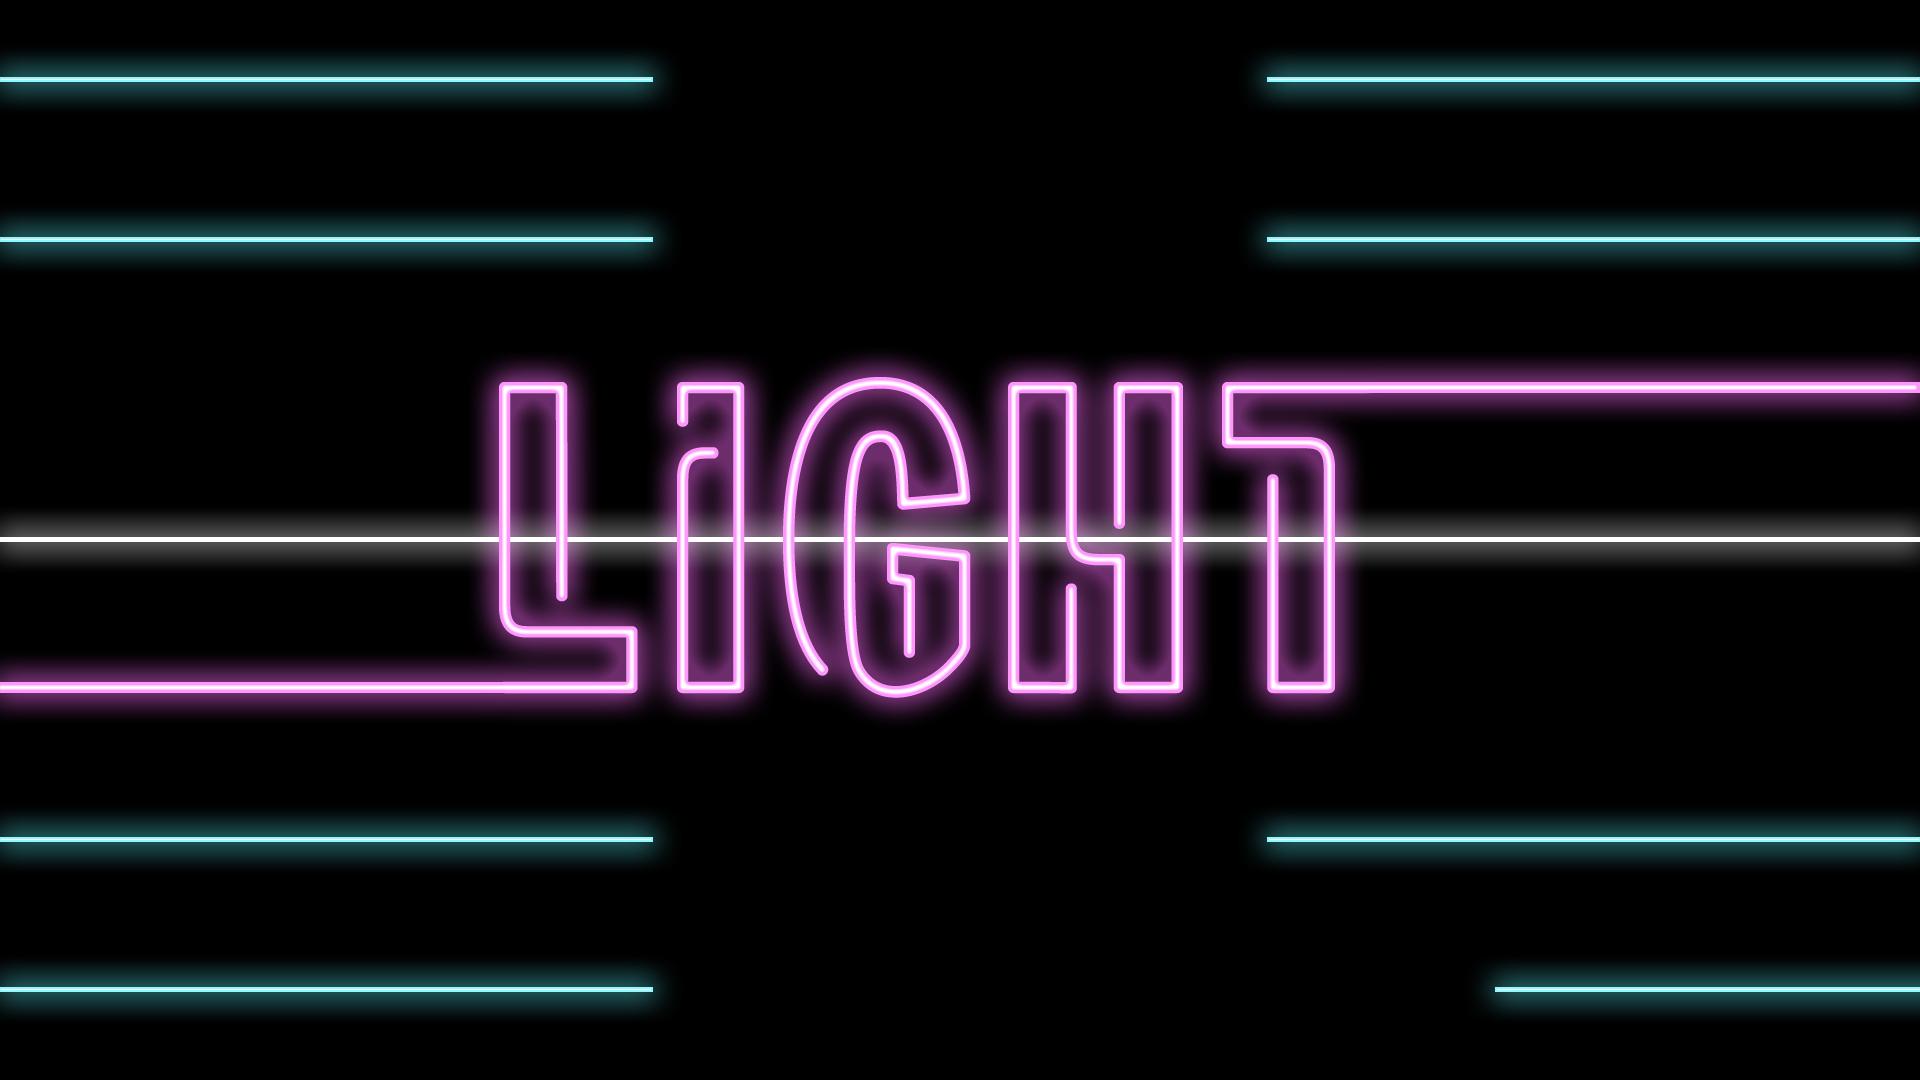 LIGHT_16x9.jpg